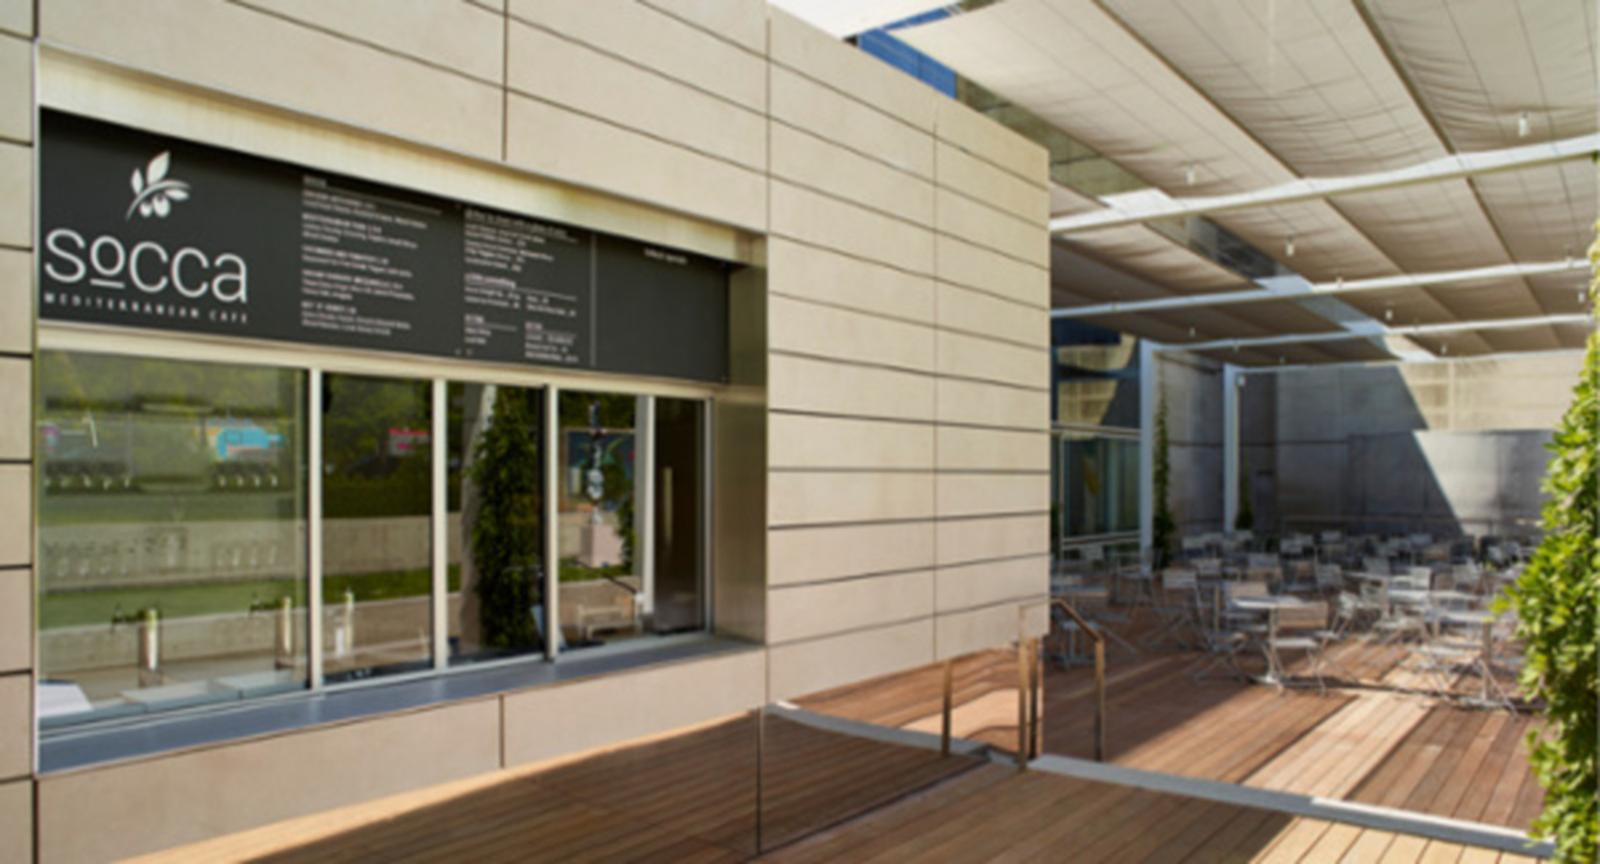 Socca Mediterranean Cafe at the DMA